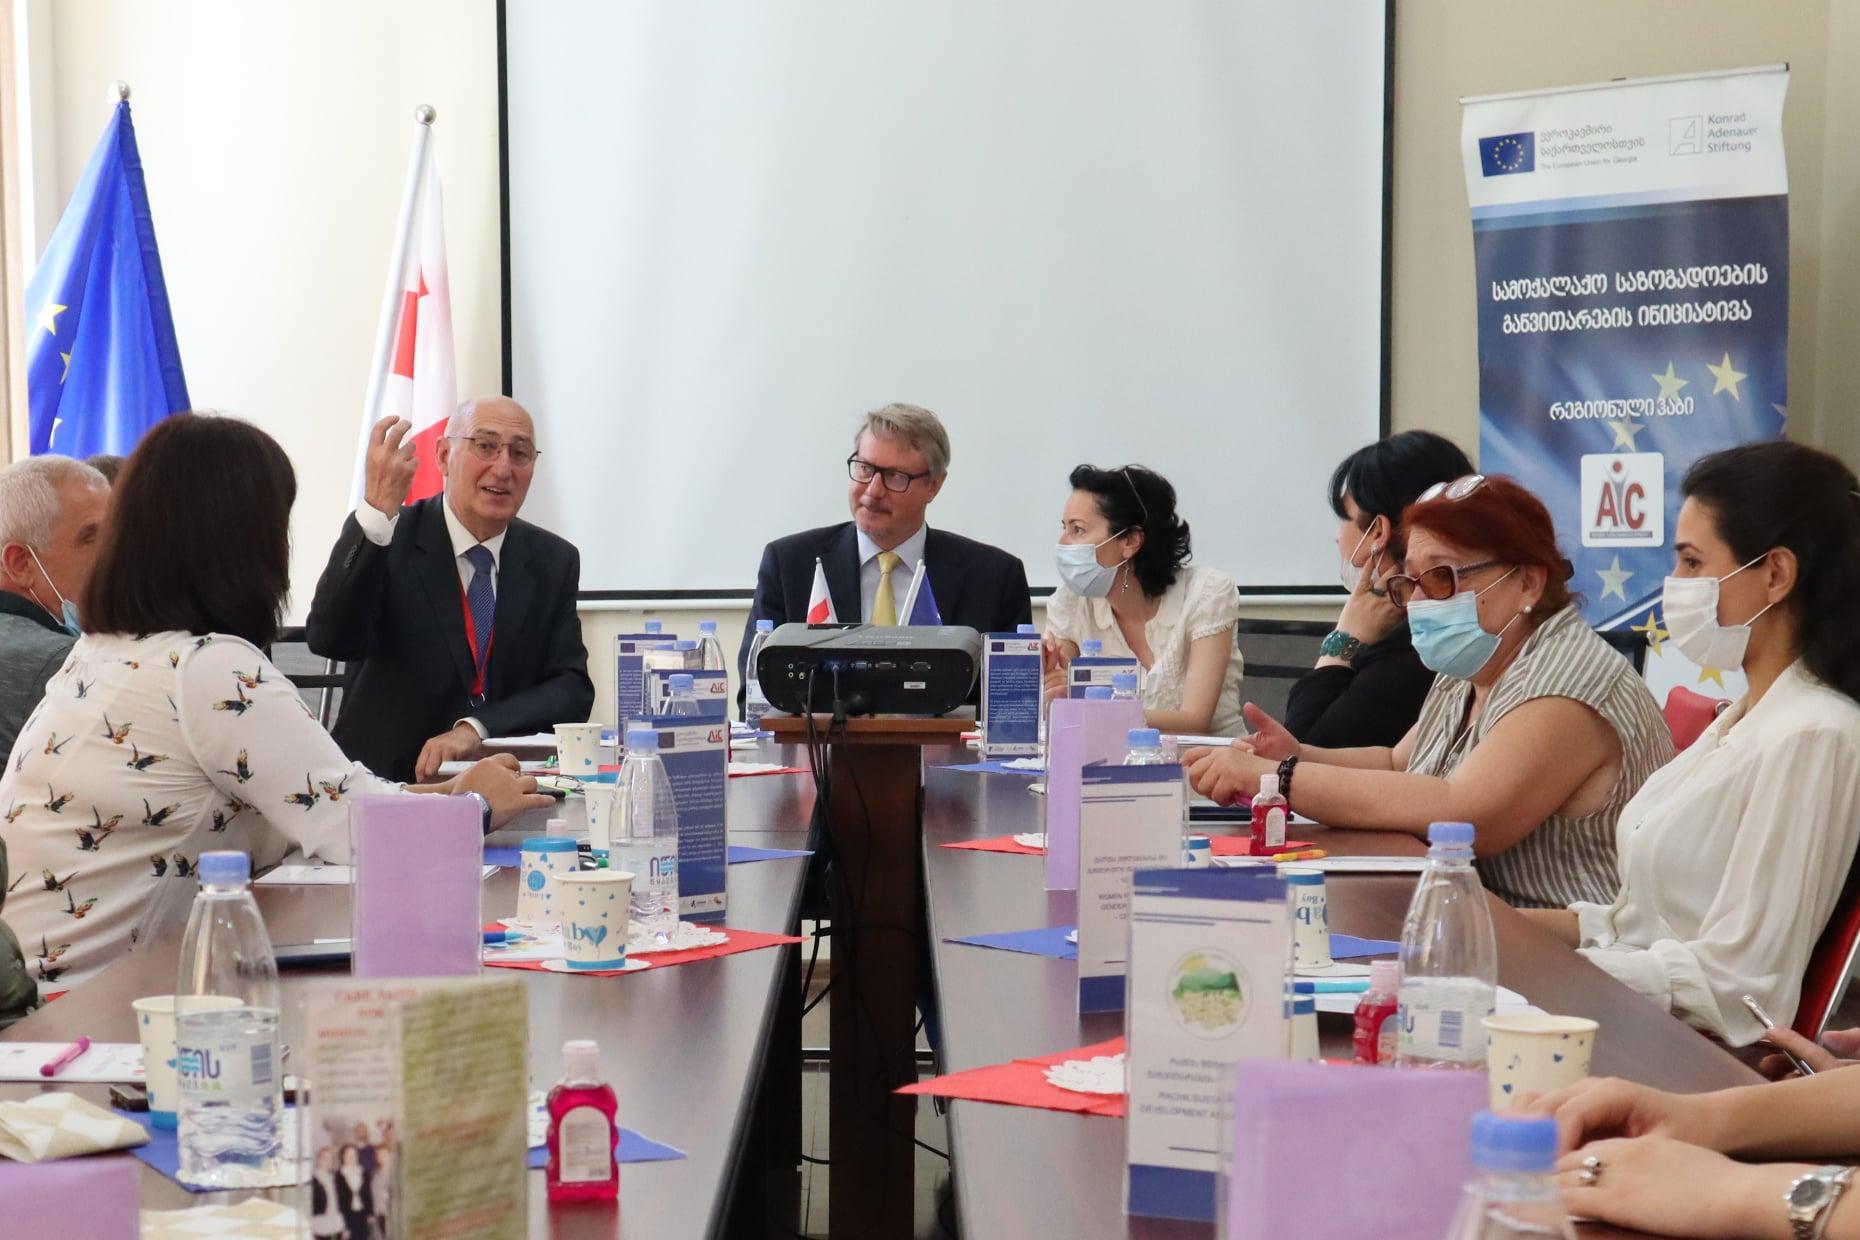 EU Ambassador Mr. Carl Hartzell visited Racha-Lechkhumi and Kvemo Svaneti regional hub